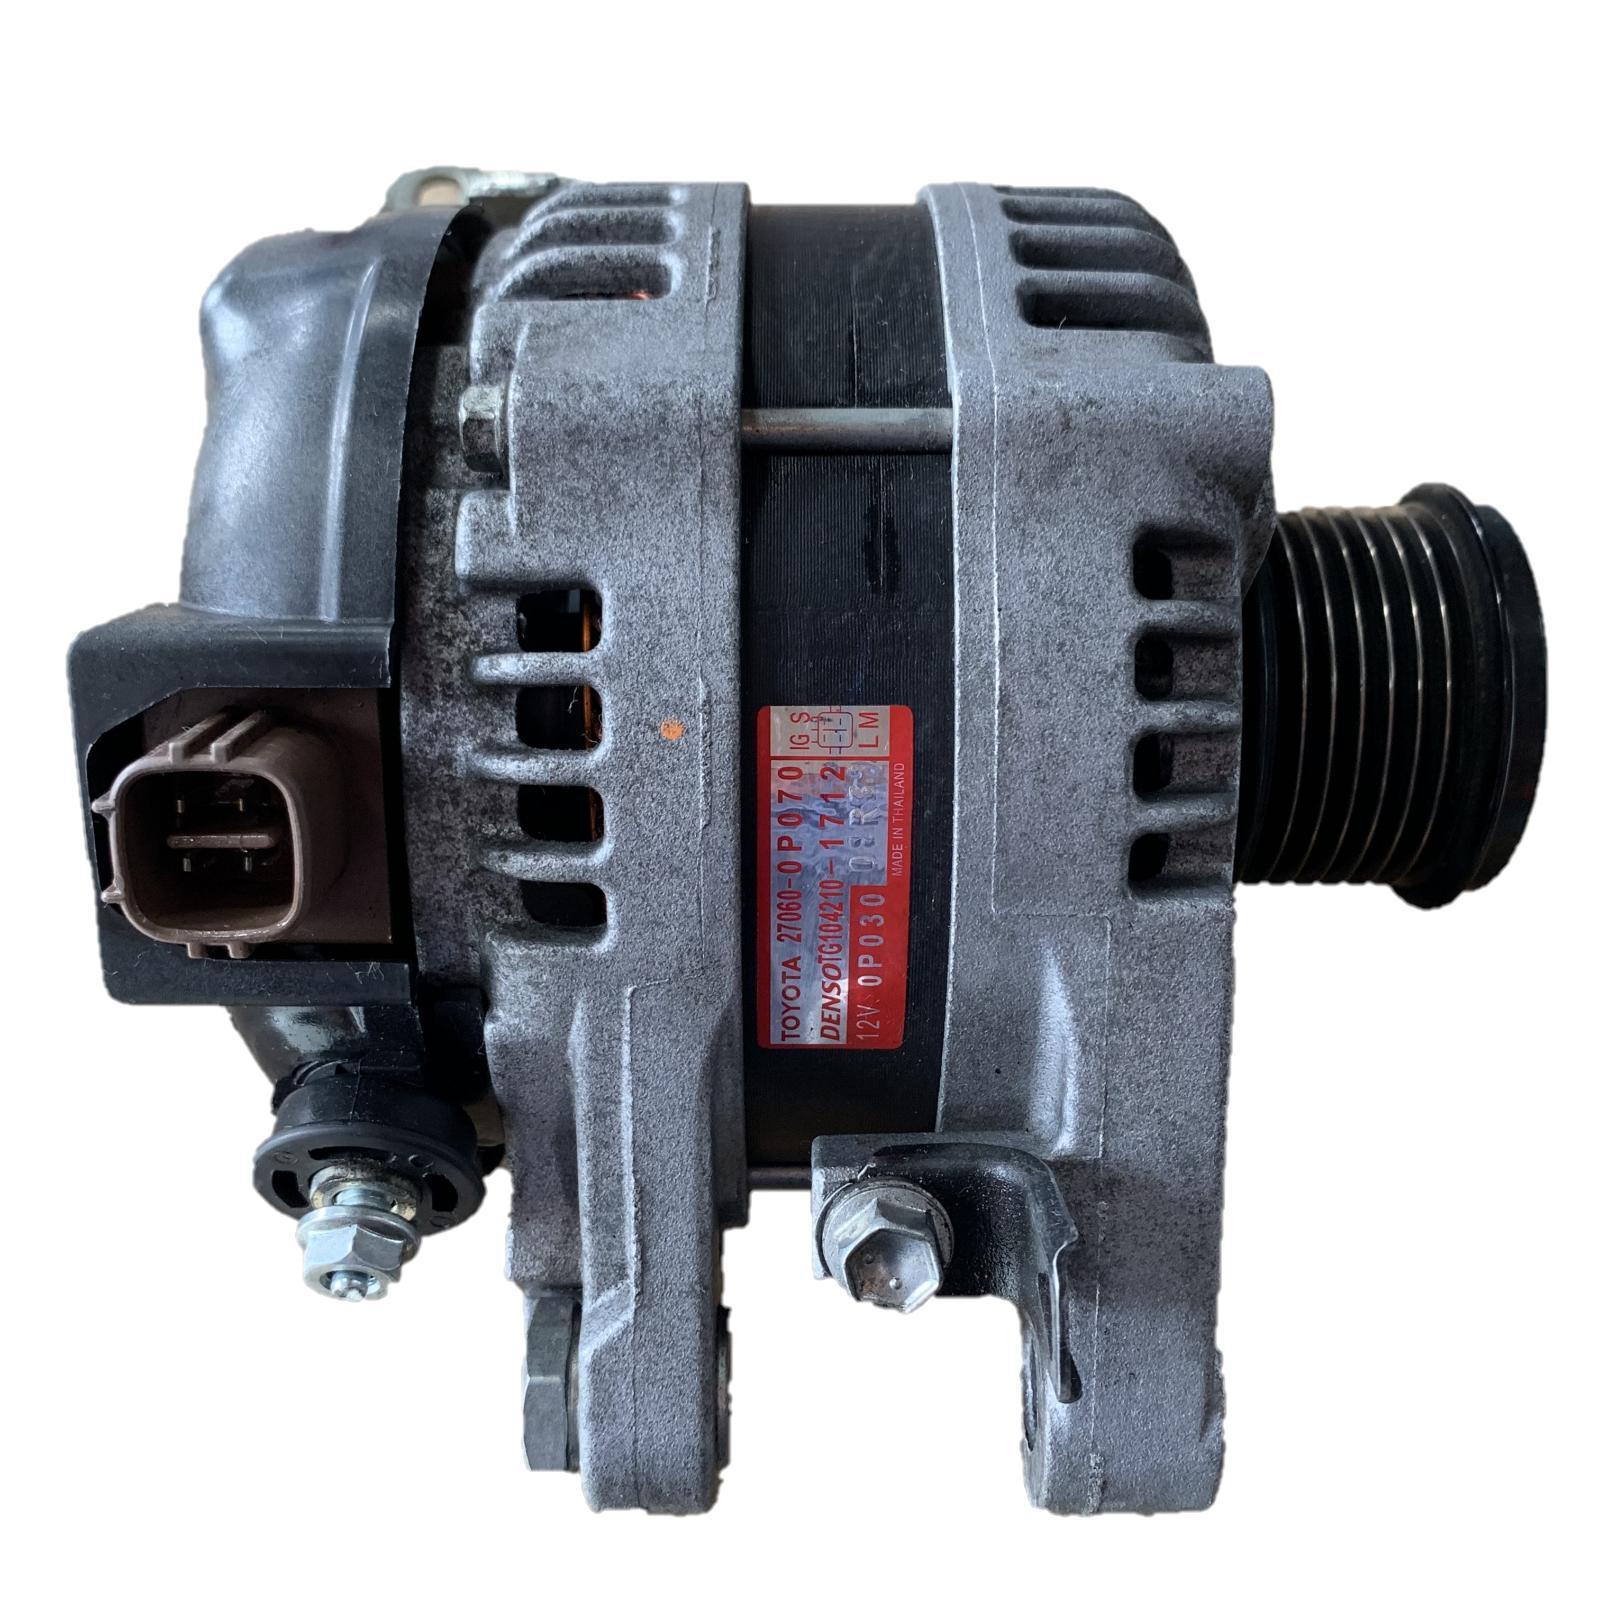 TOYOTA AURION, Alternator, 3.5, 2GR-FE, GSV50R, 04/12-08/17